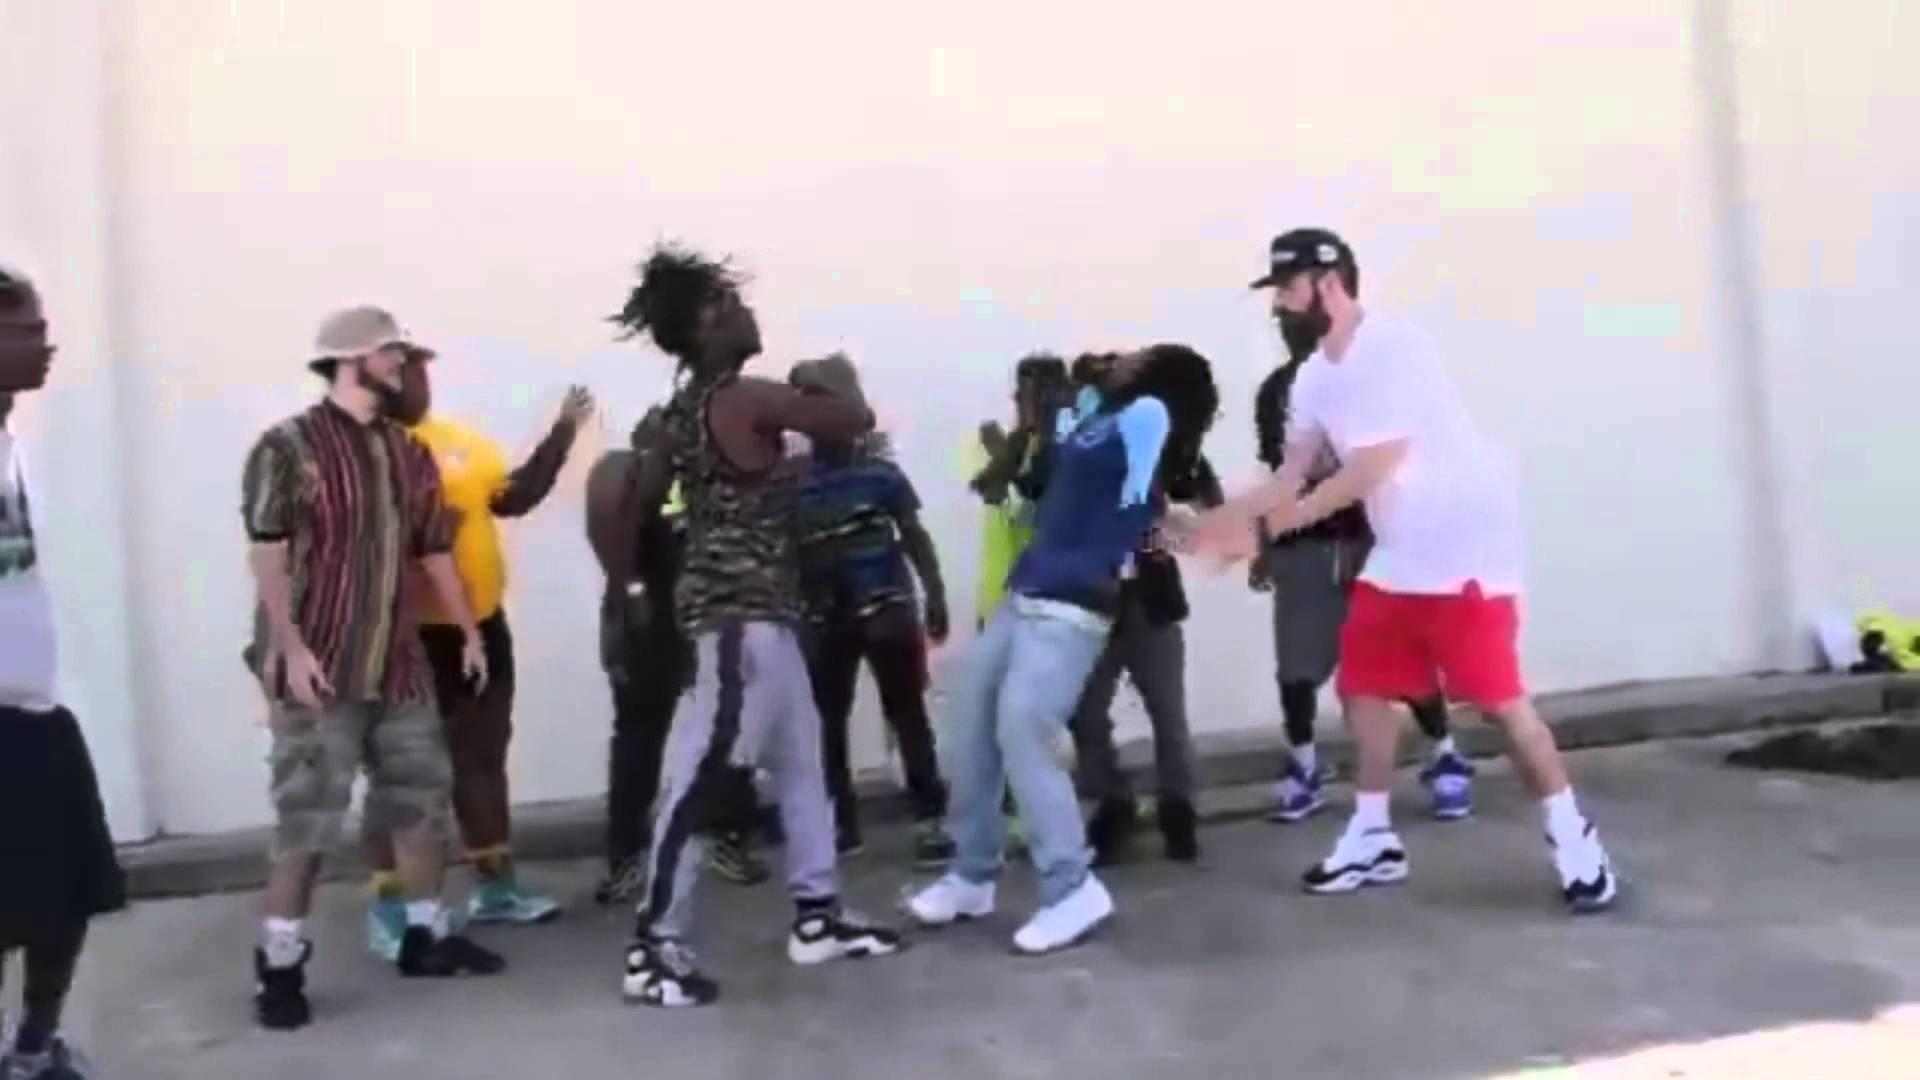 Modern Street Dance – Houston Hit Them Folks   NEW 2015 HOT TREND STR8 DROP